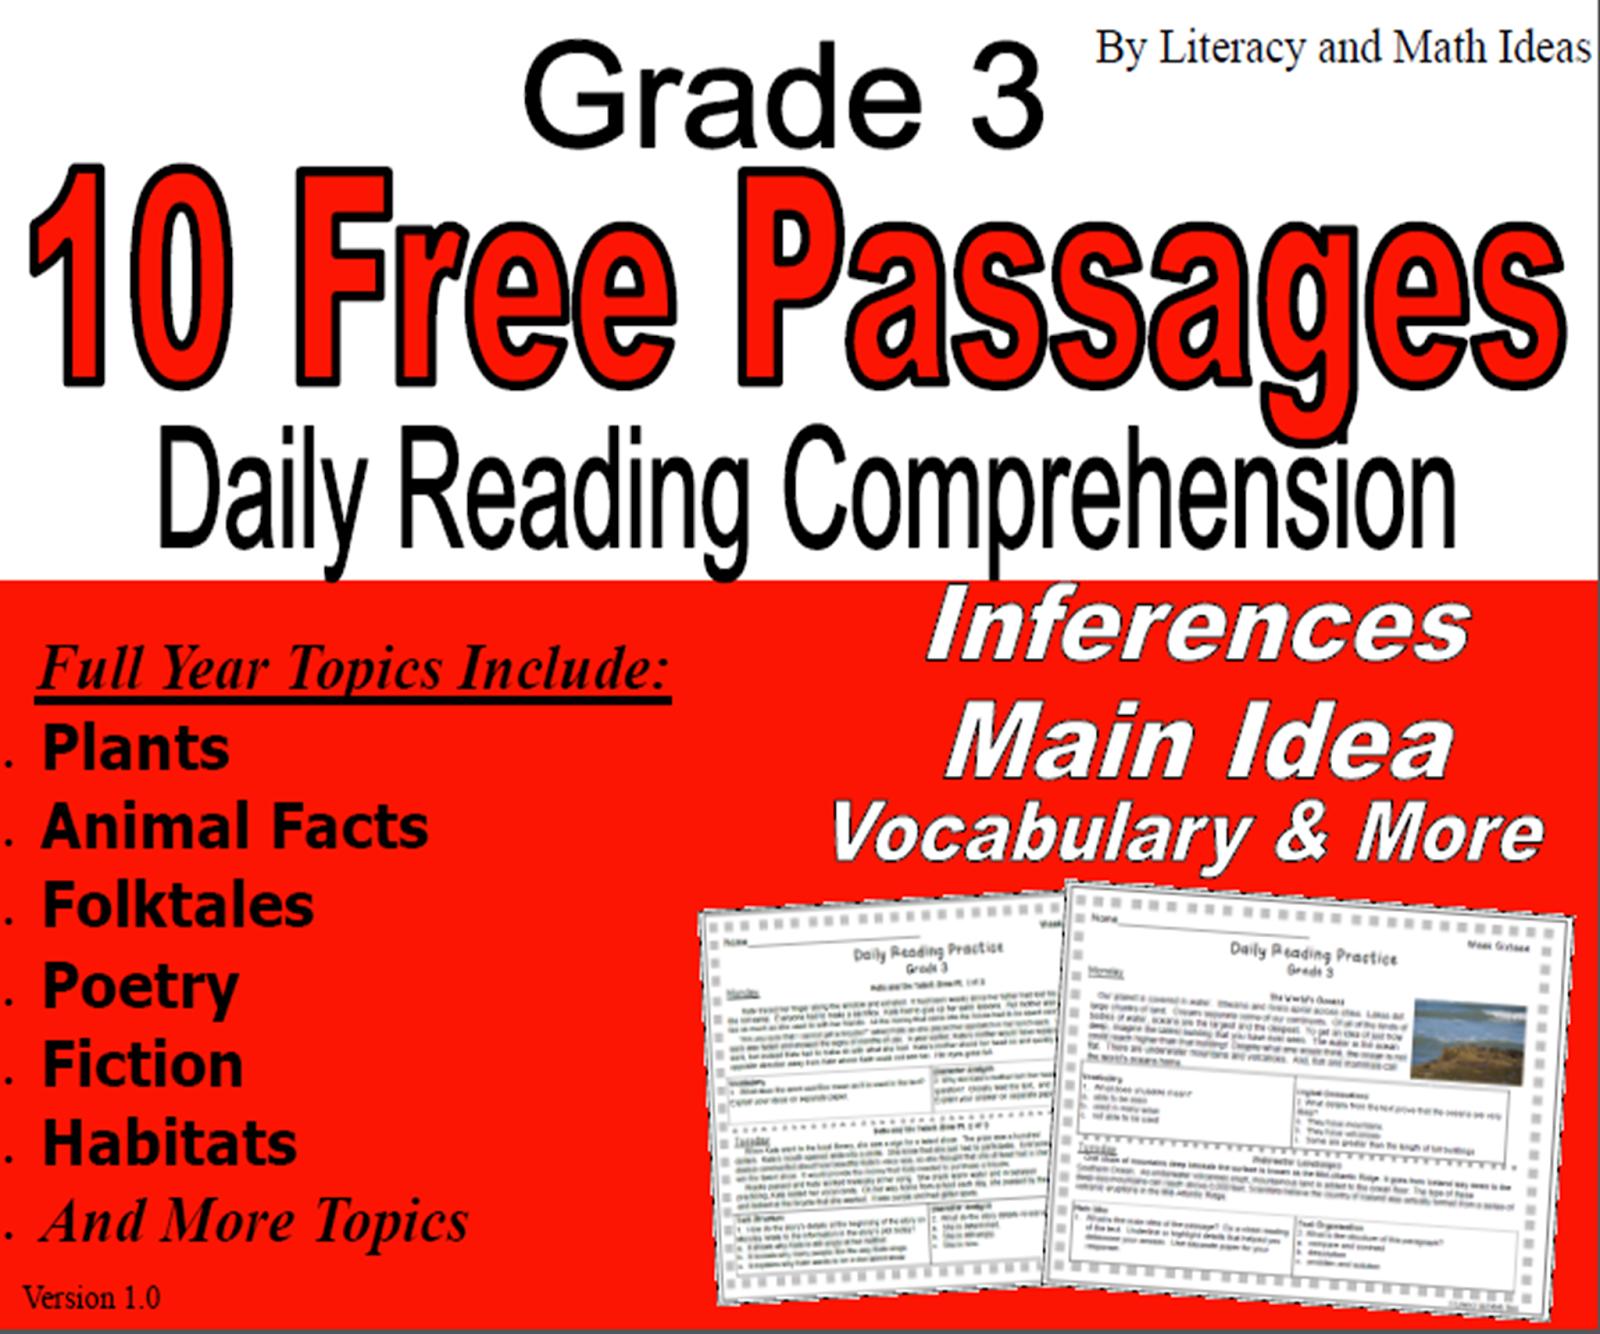 Literacy & Math Ideas: Free Third Grade Resource (10 Free Reading